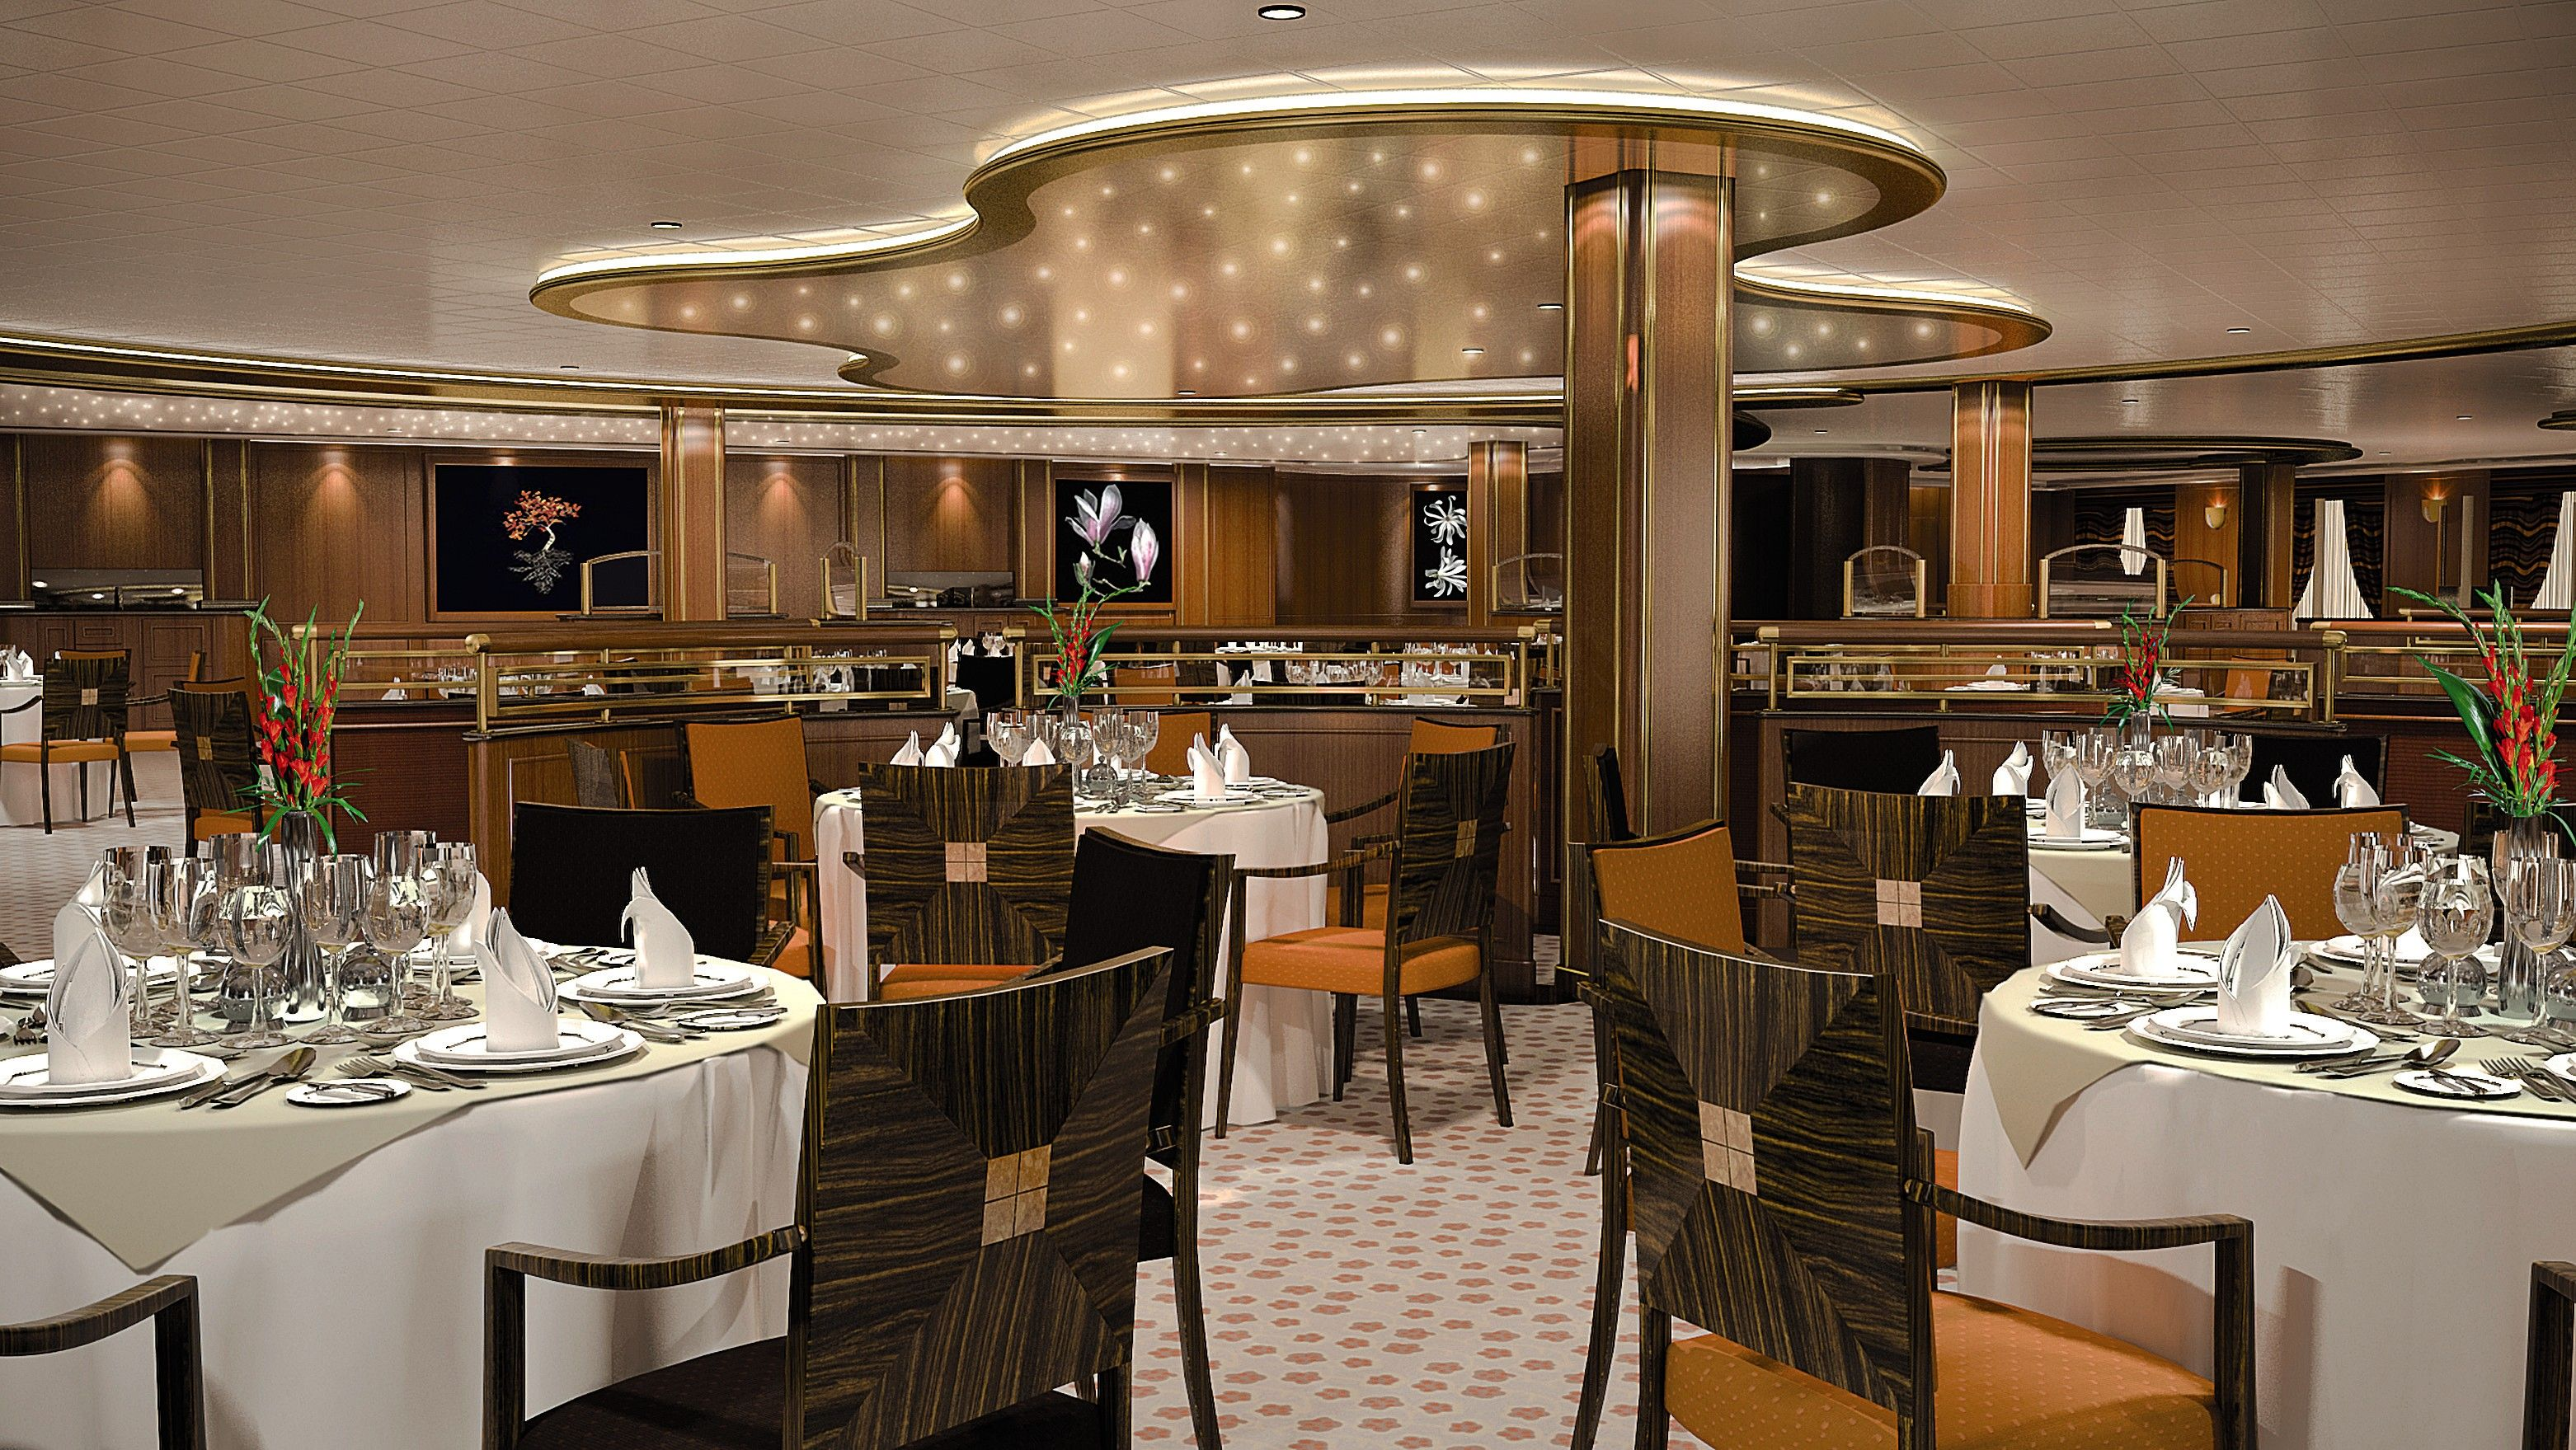 Dining area the azura p o cruises pinterest cruises dining area the azura baanklon Image collections